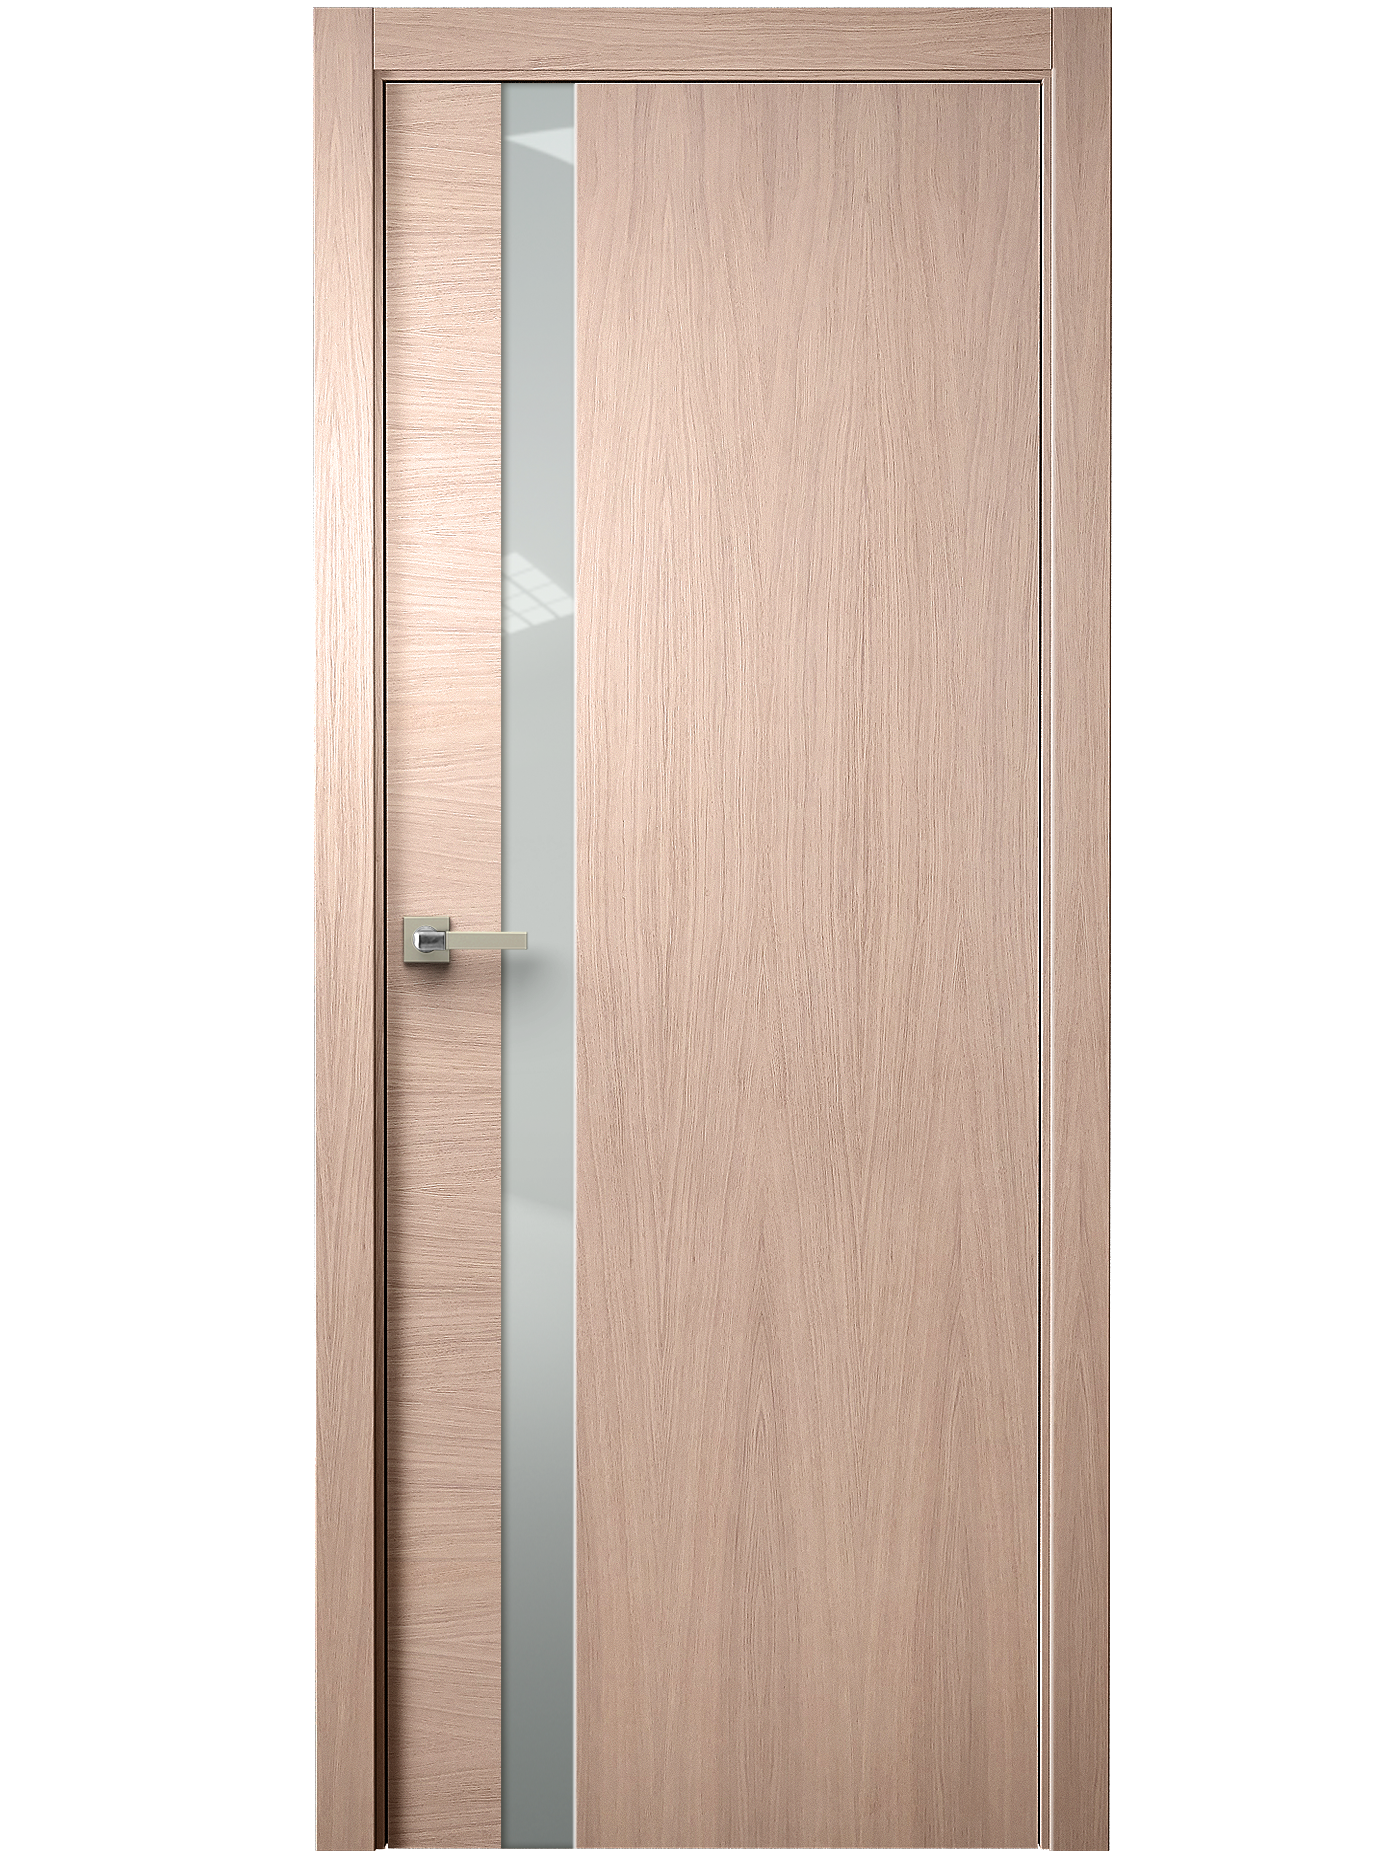 Image Lago Interior Door Brushed Oak Tone 12 0